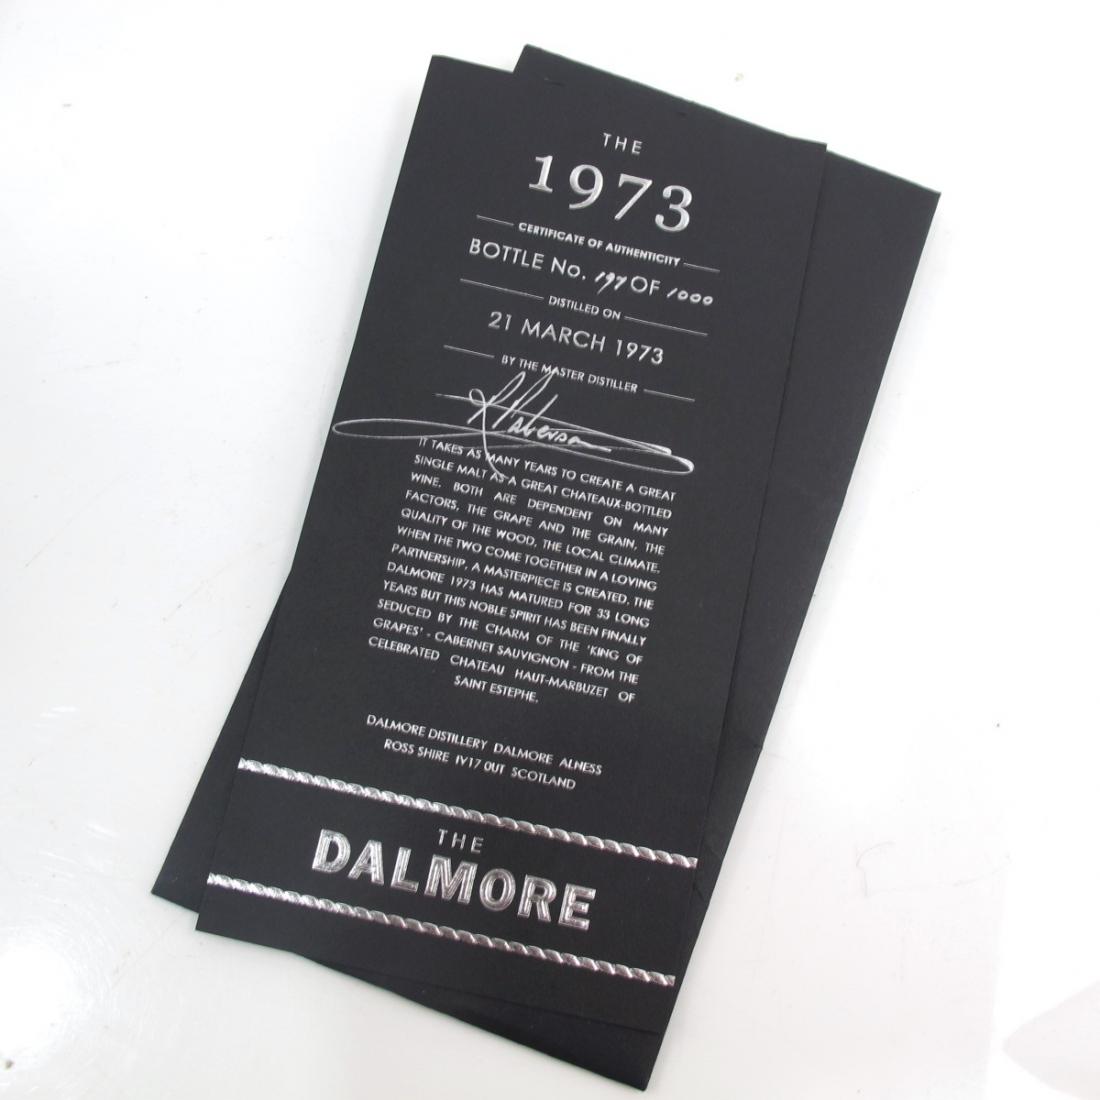 Dalmore 1973 Cabernet Sauvignon / Haut Marbuzet Finish